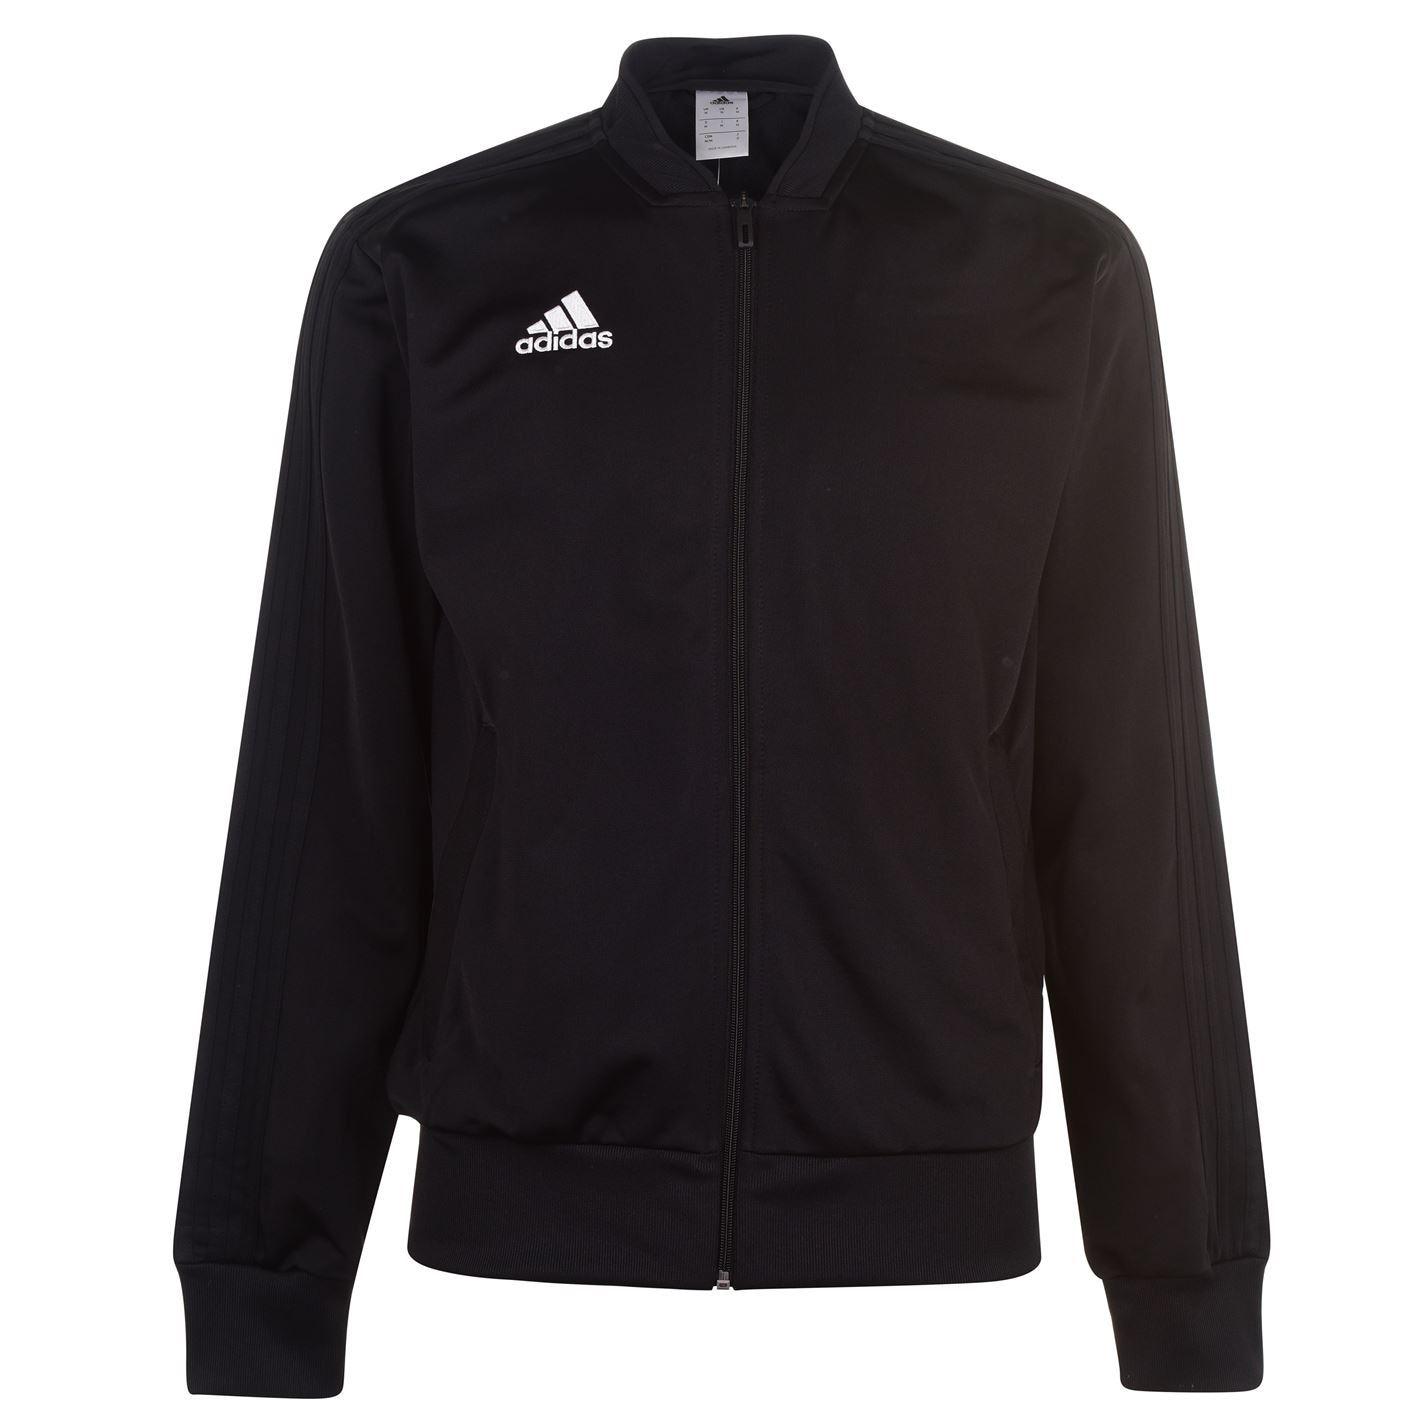 adidas jacke schwarz fußball